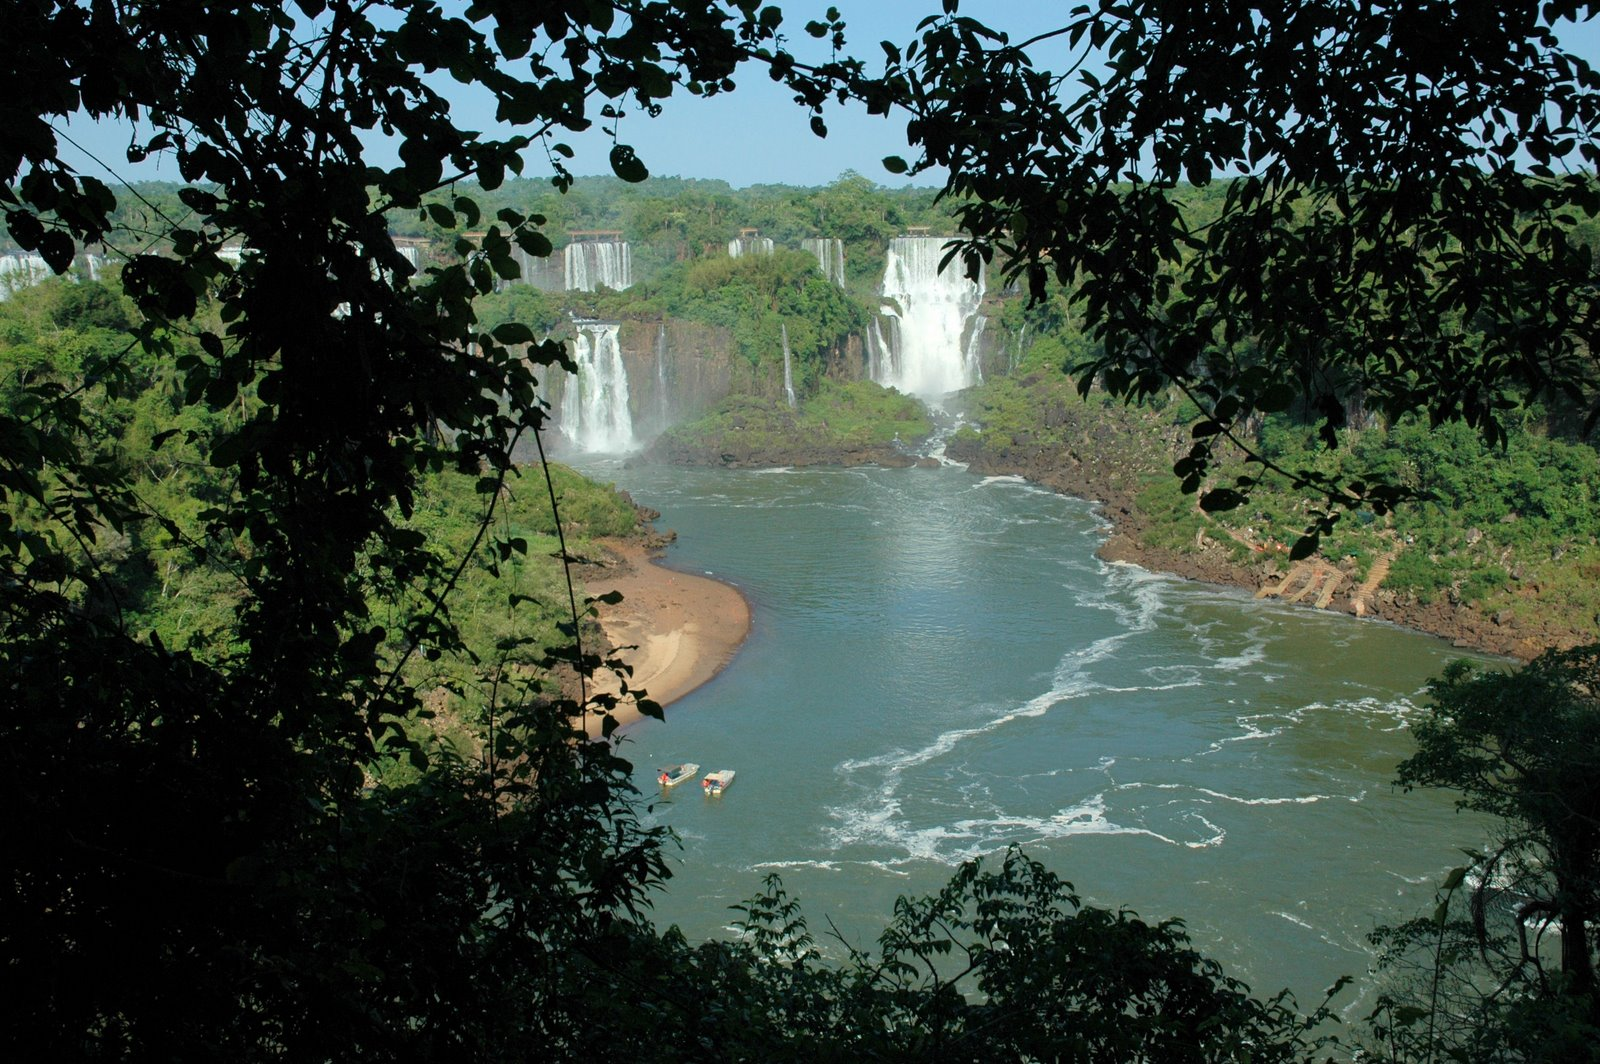 The Nomadic Pinoy: Parque Nacional do Iguacu, Brazil